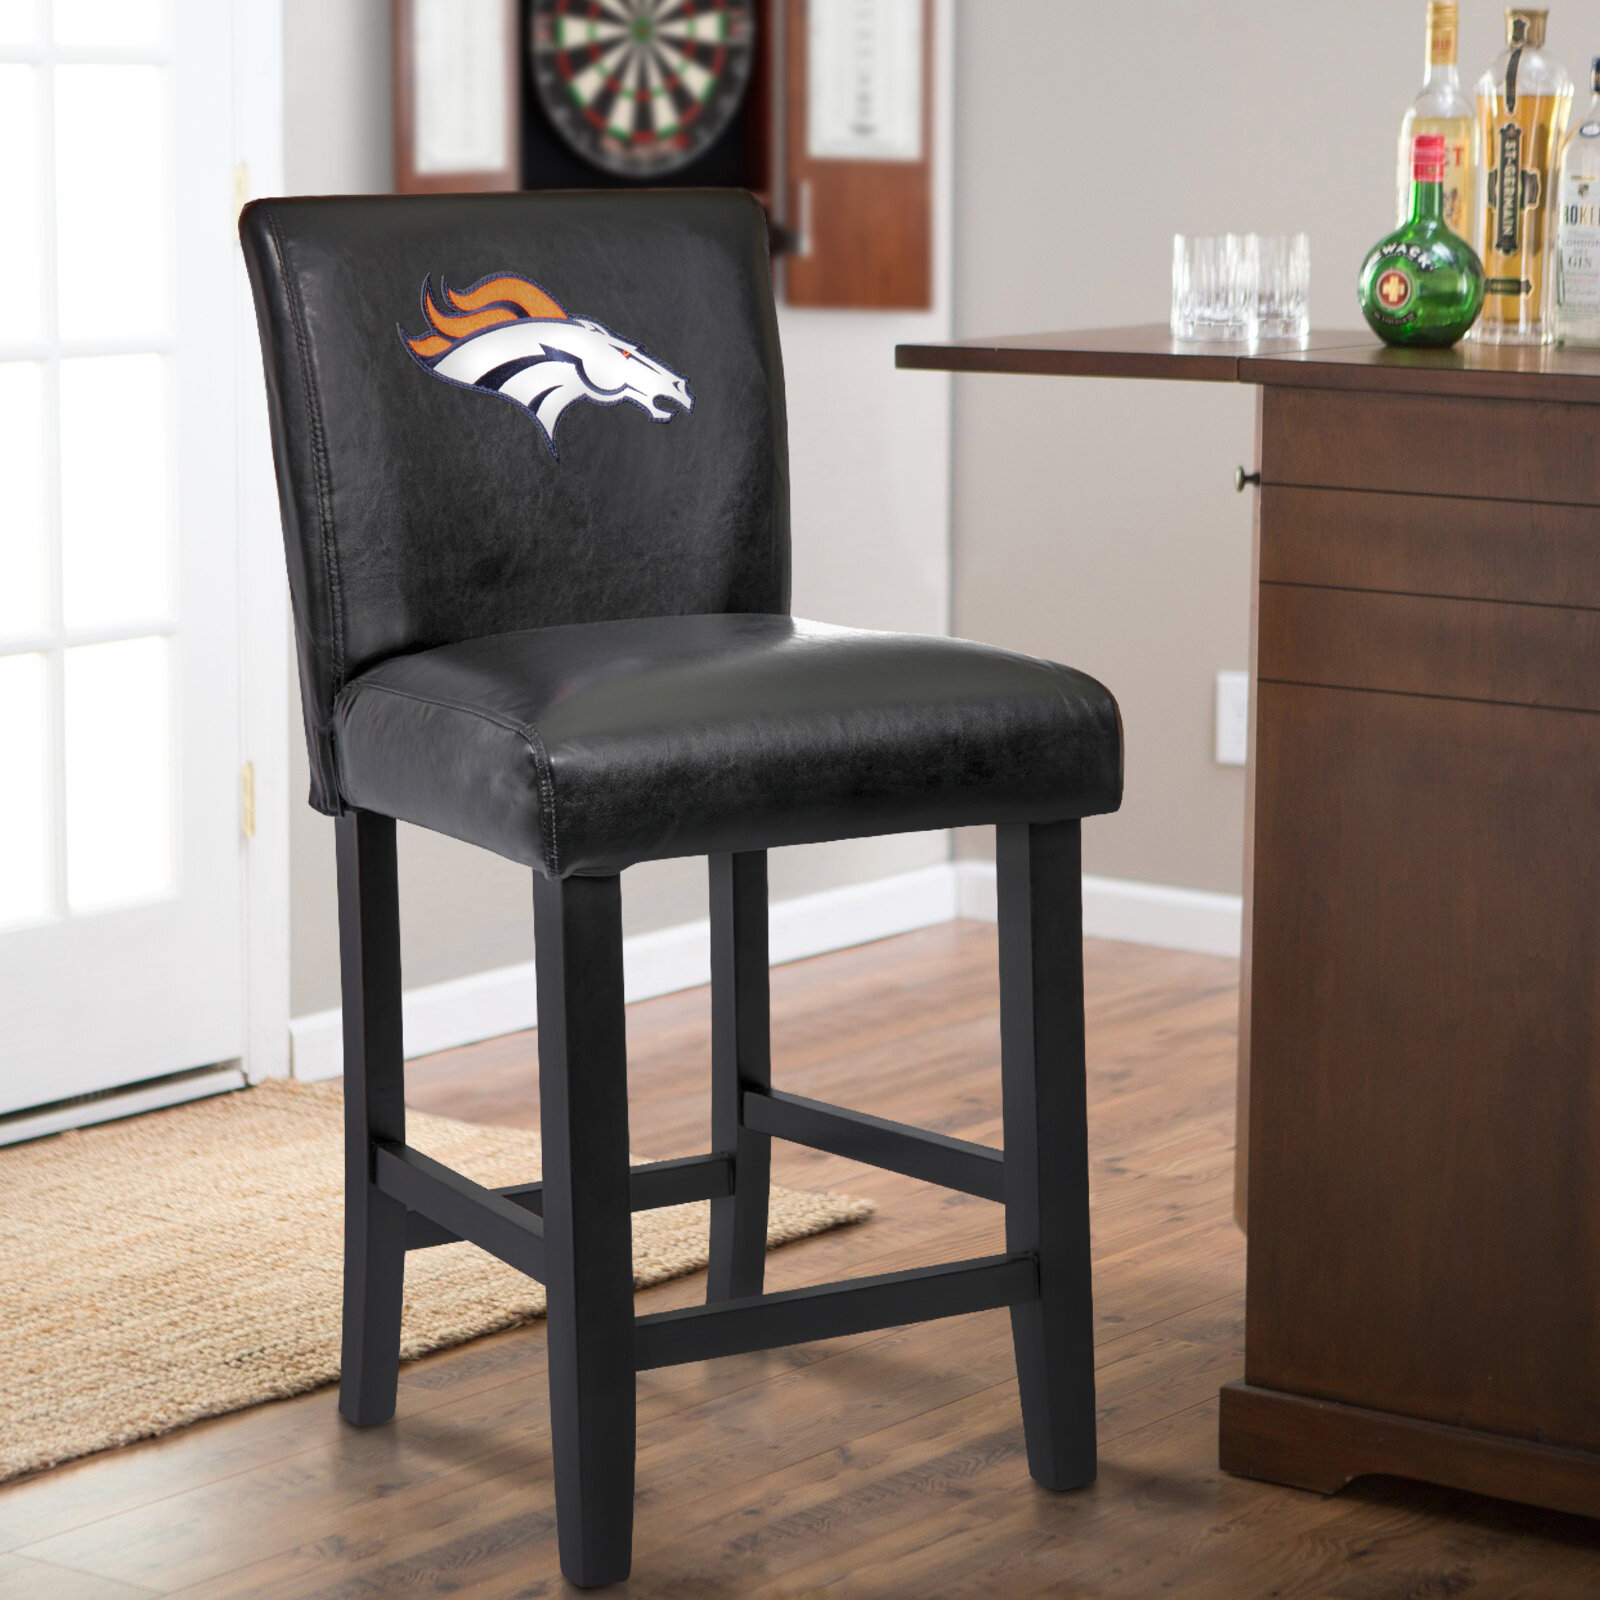 Surprising 24 Upholstered Bar Stool Evergreenethics Interior Chair Design Evergreenethicsorg